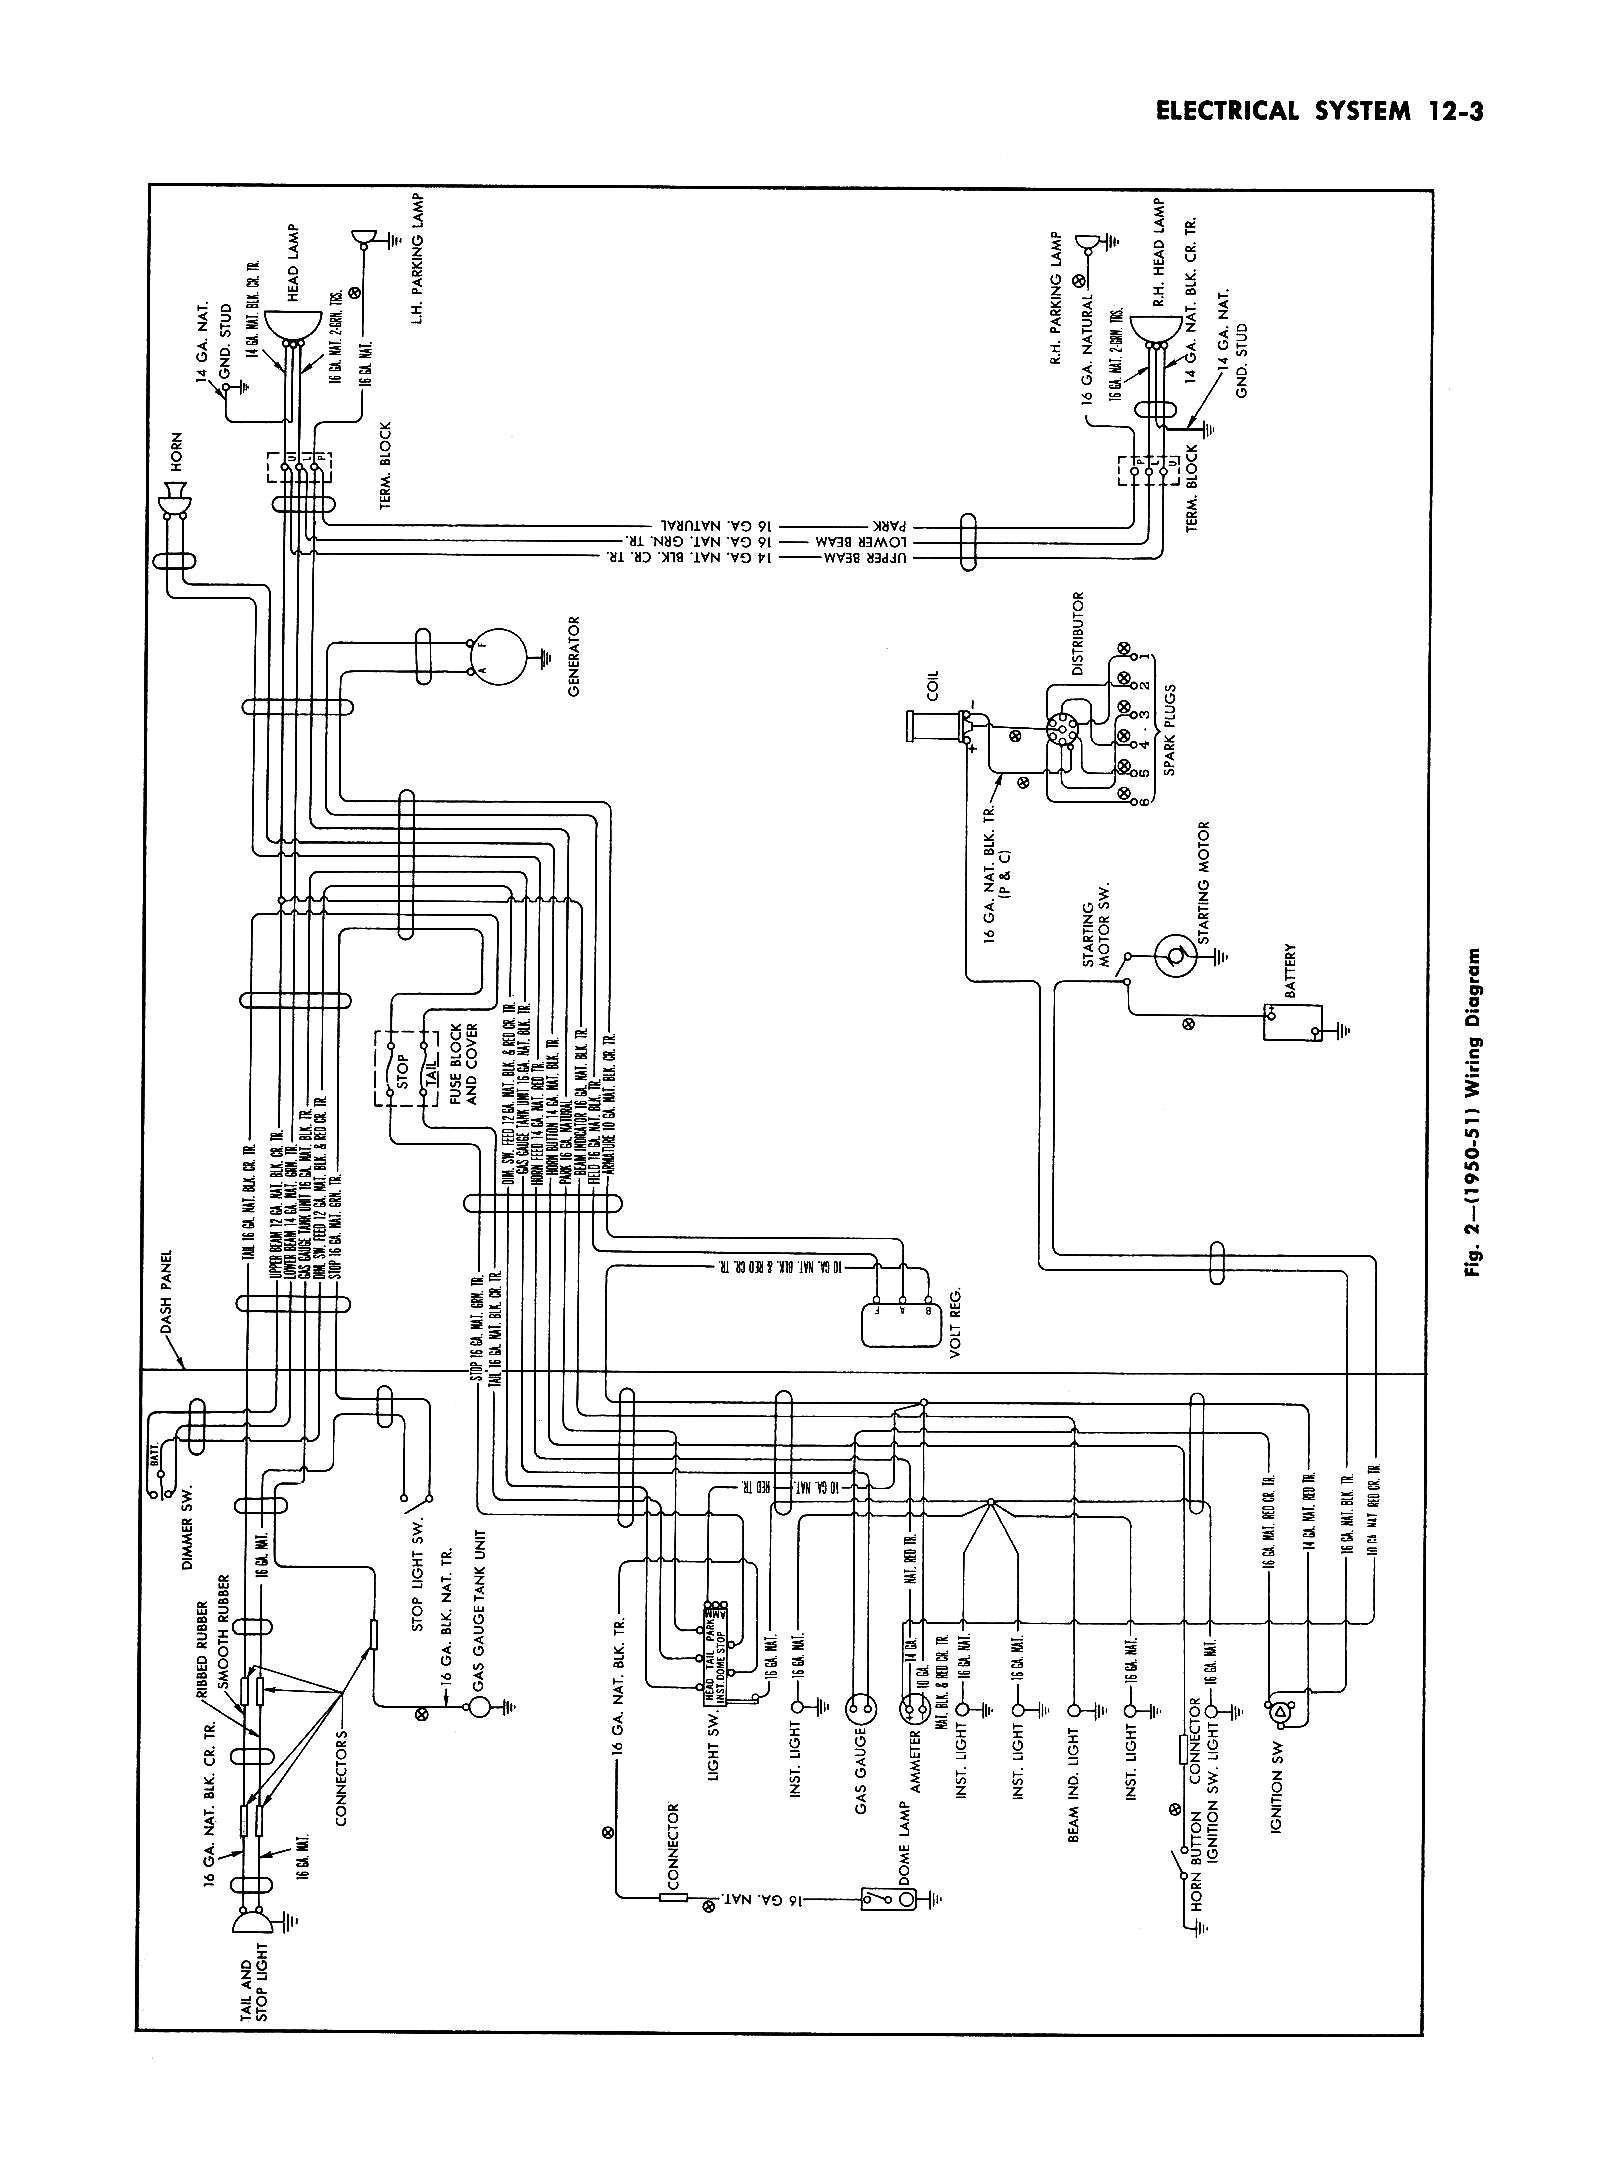 Wiring Diagram Cars Trucks Wiring Diagram Cars Trucks Truck Horn Wiring Wiring Diagrams Chevy Trucks 1966 Chevy Truck 1951 Chevy Truck